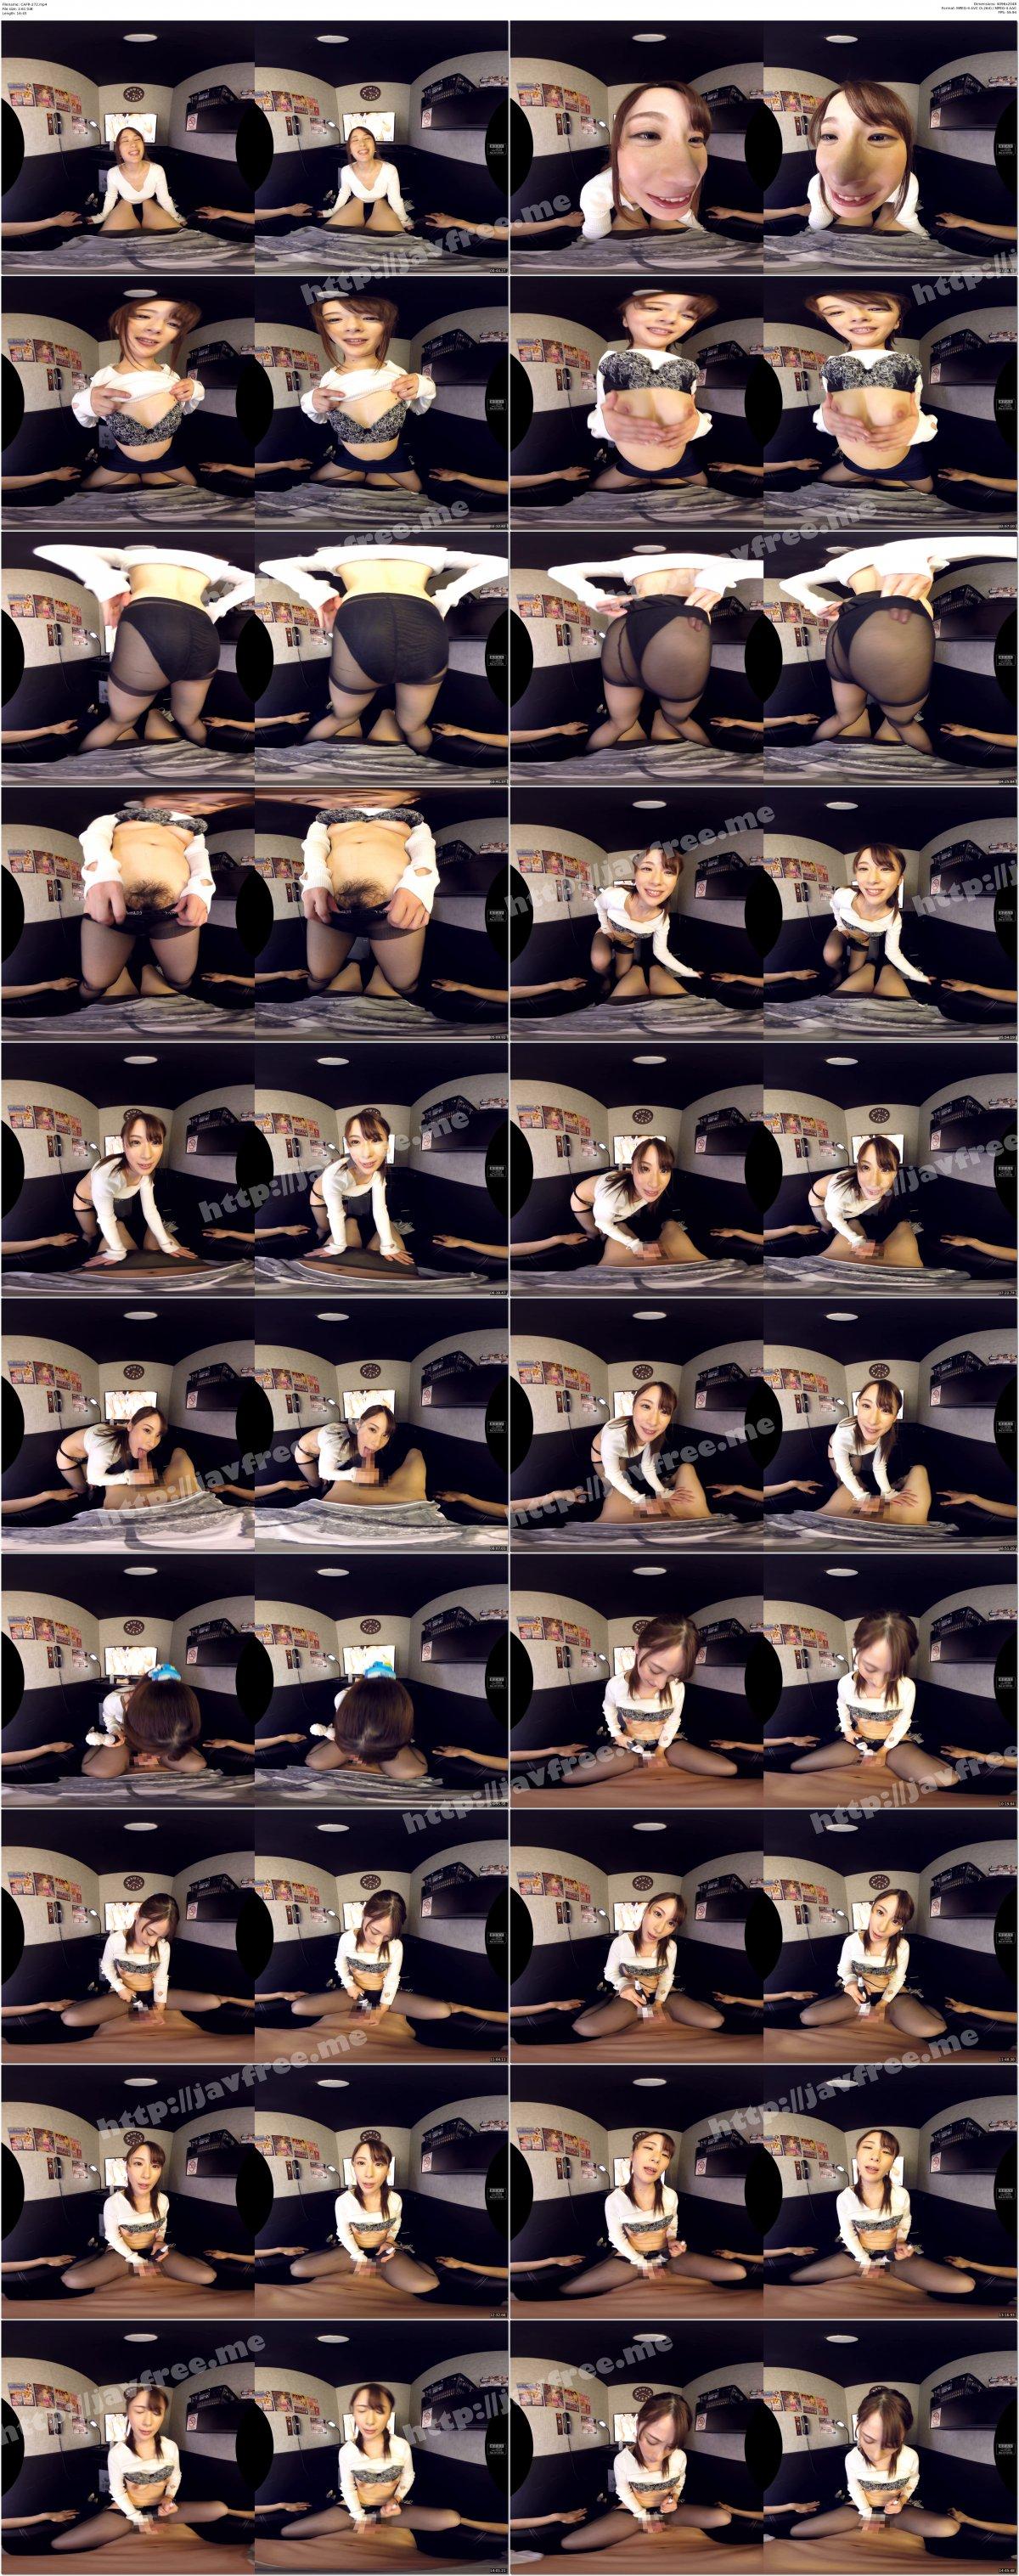 [CAFR-272] 【VR】HQ高画質対応 乱入!ハプニング個室ビデオ 橋本れいか - image CAFR-272 on https://javfree.me